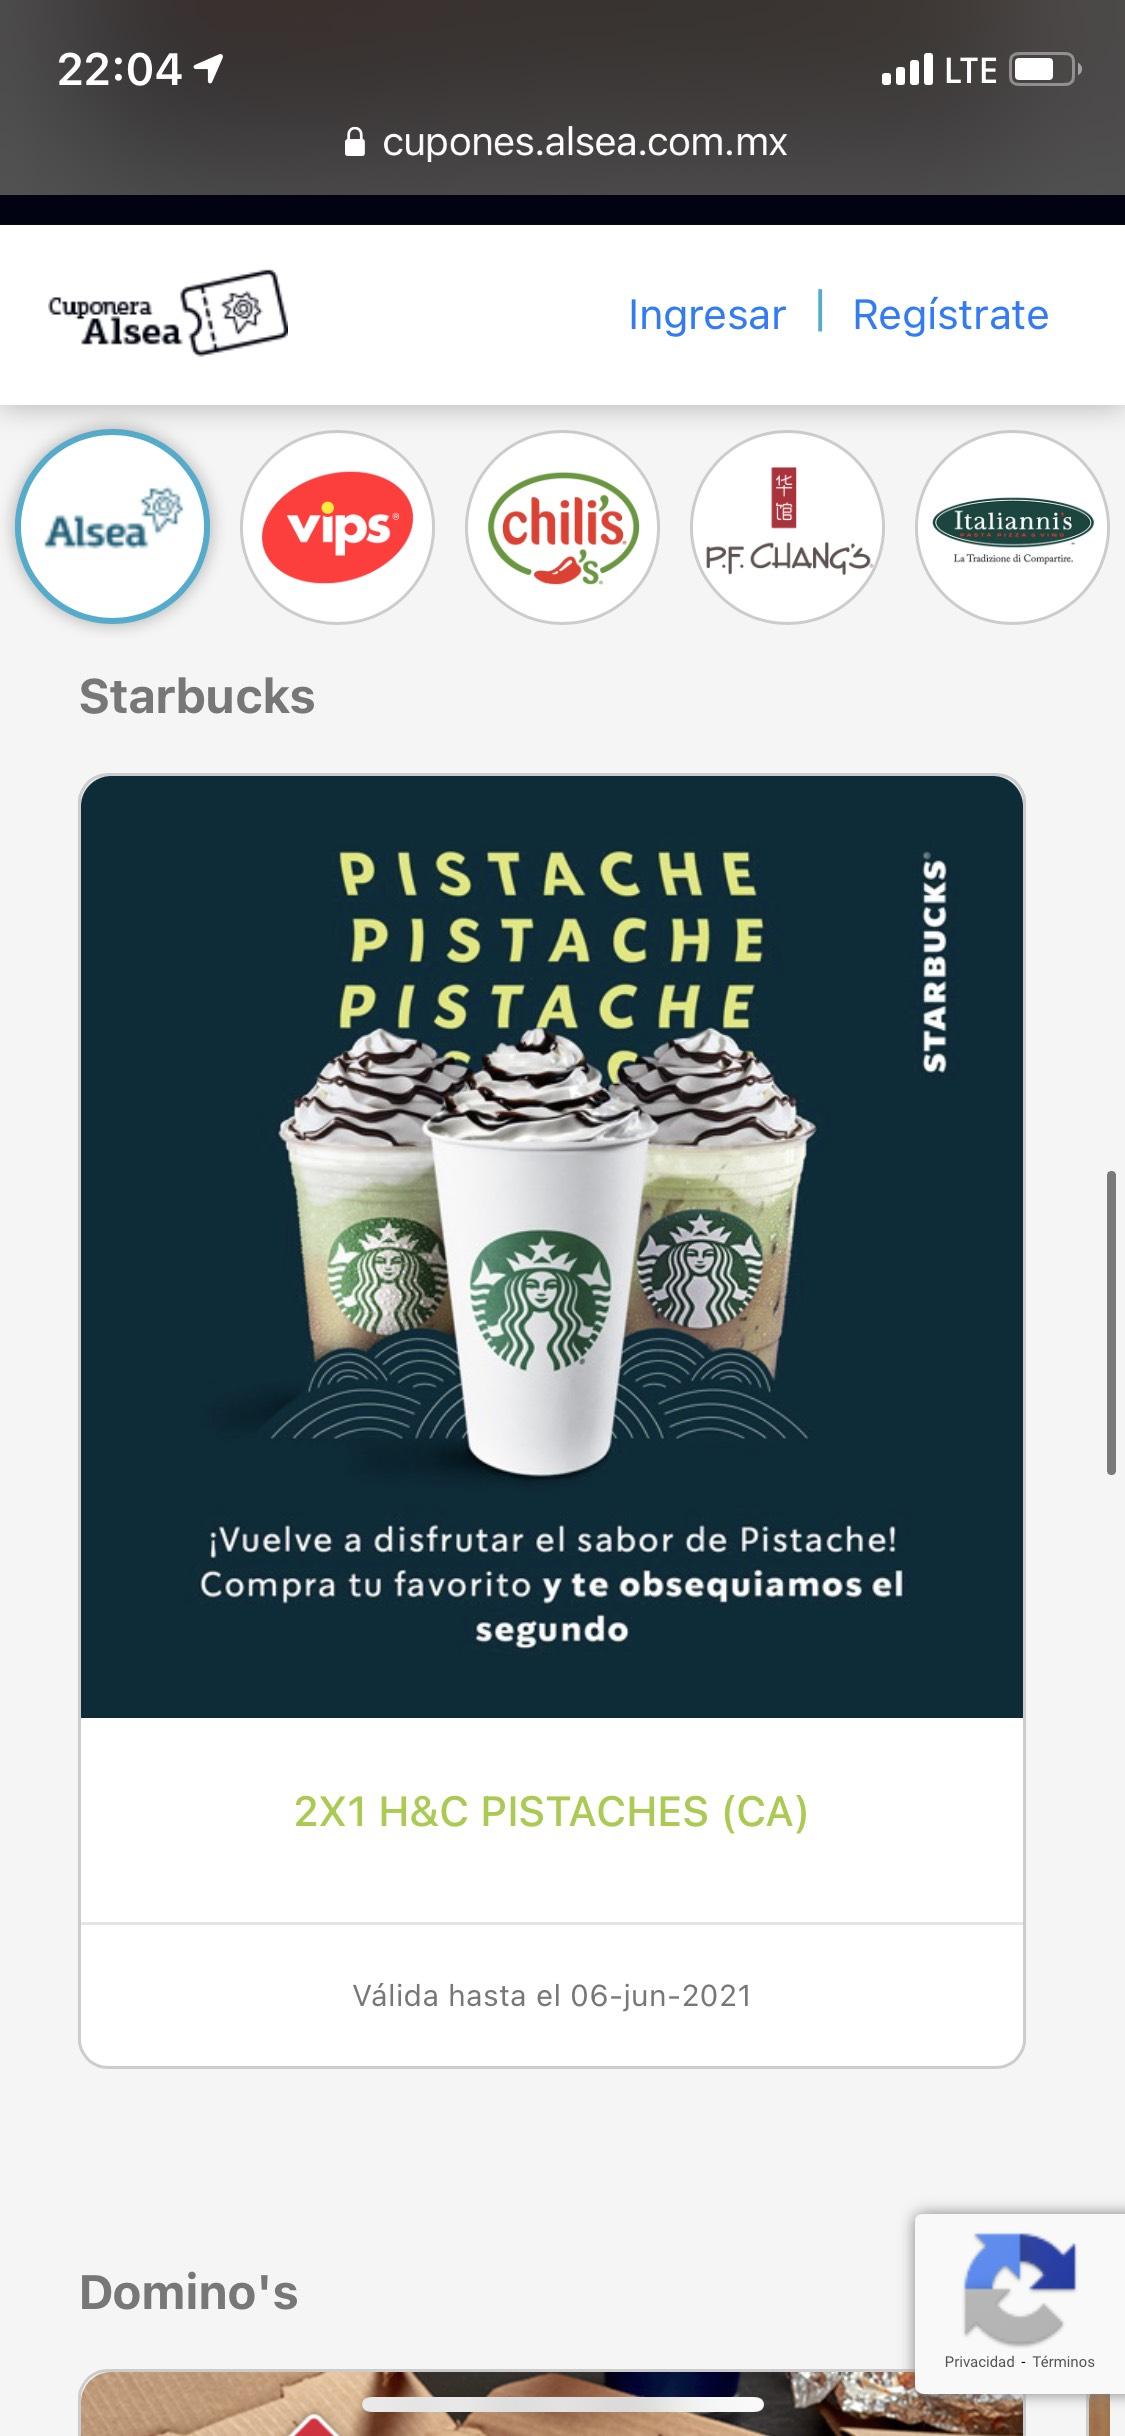 Starbucks 2X1 H&C PISTACHES